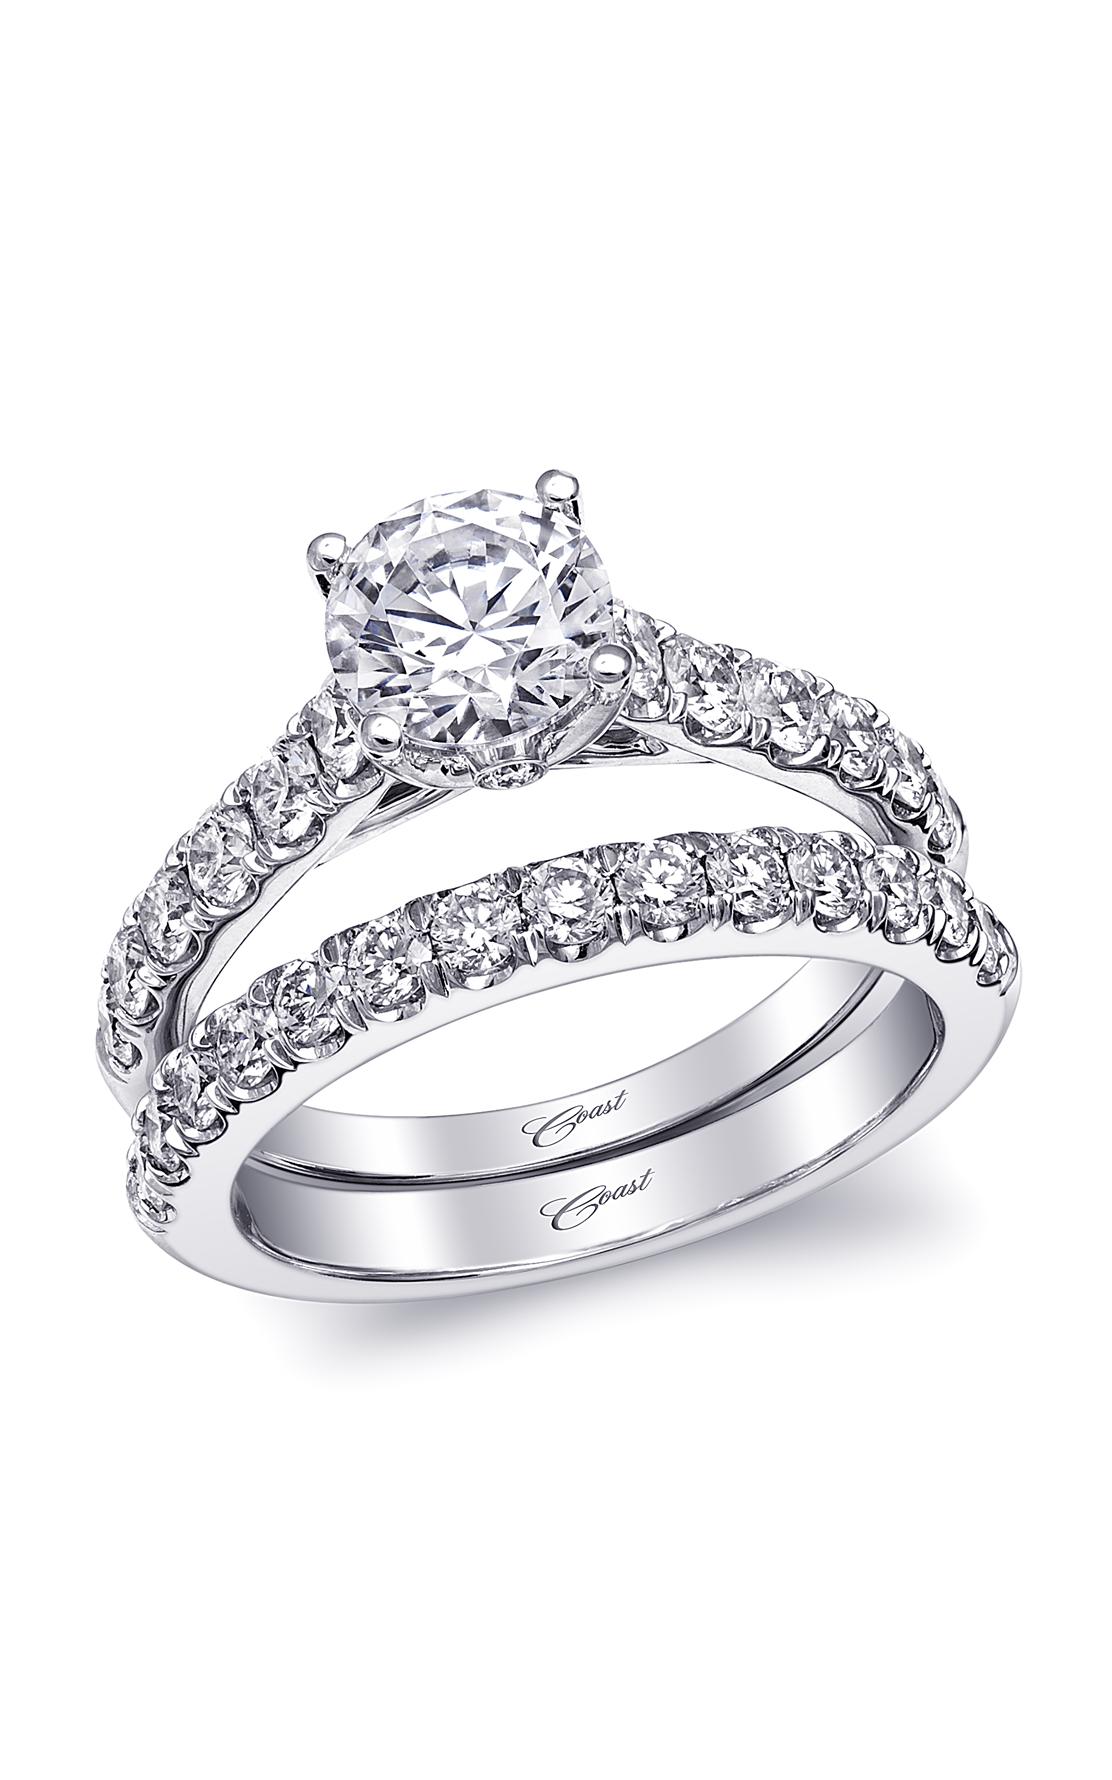 Coast Diamond Charisma LC5461 product image